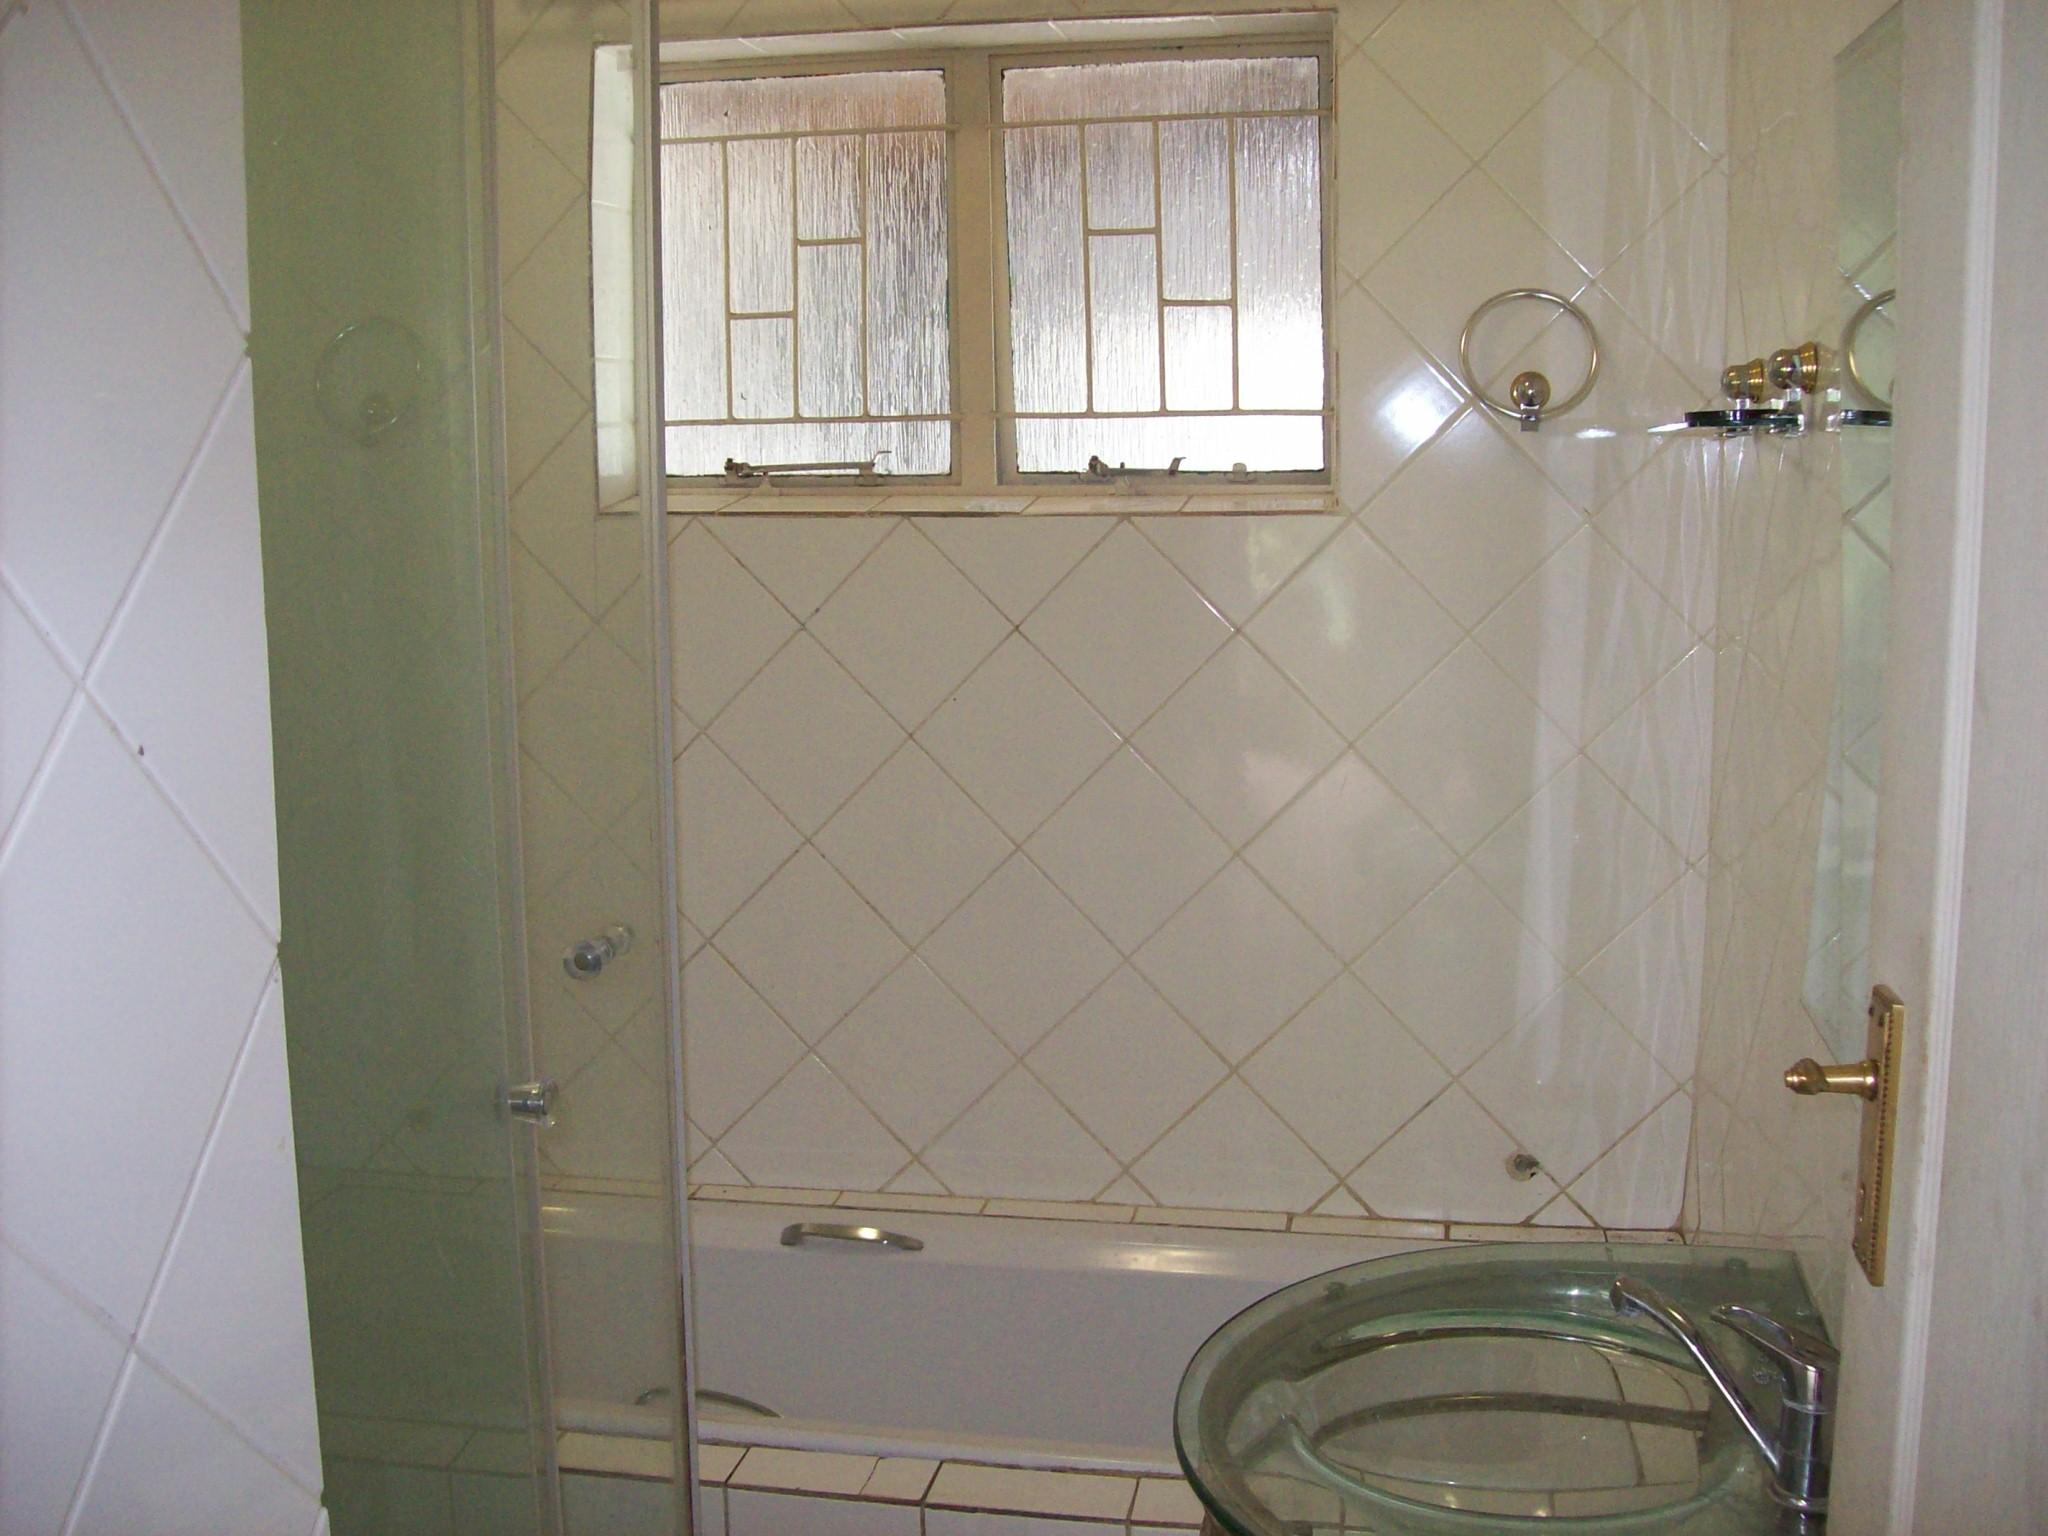 4 Bedroom house in Polokwane